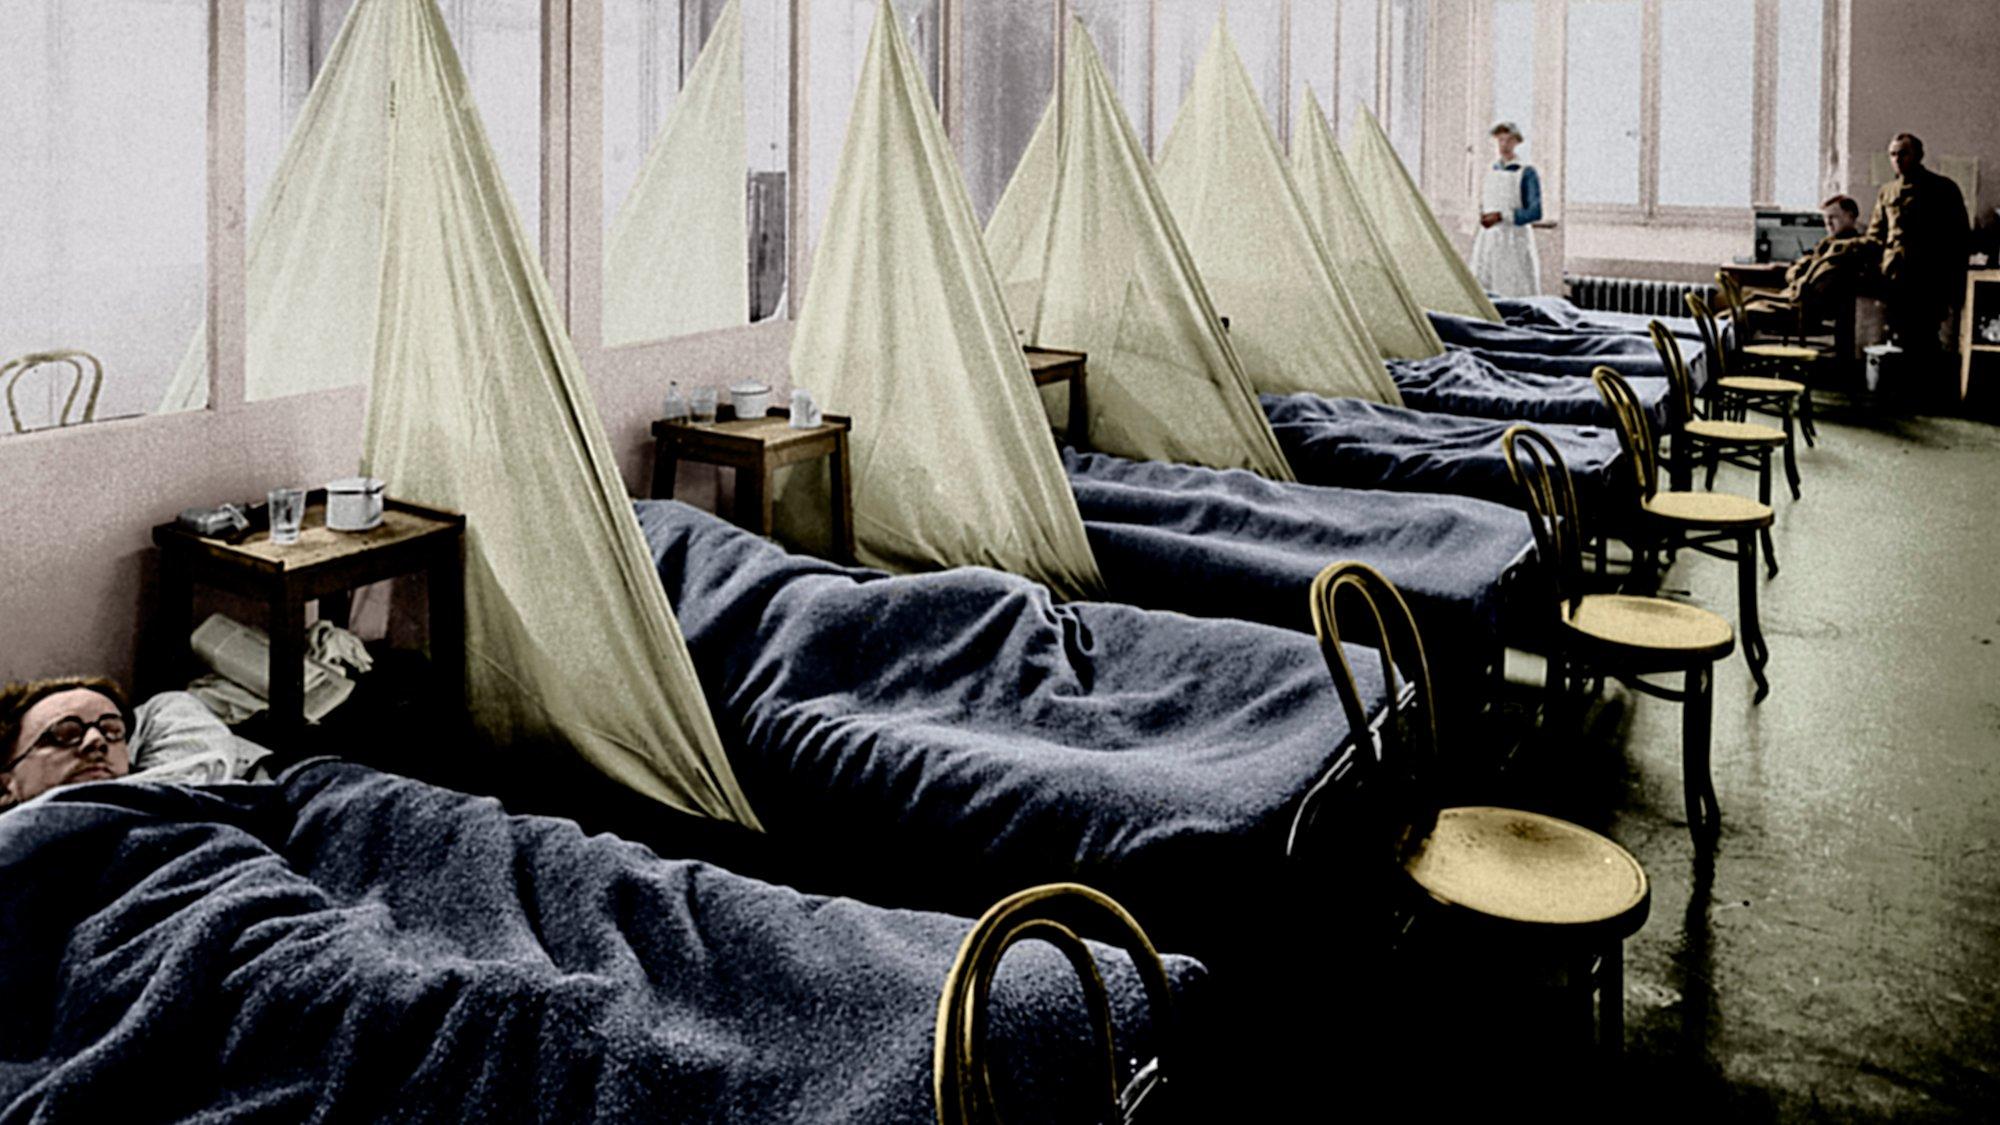 Spanische Grippe Corona